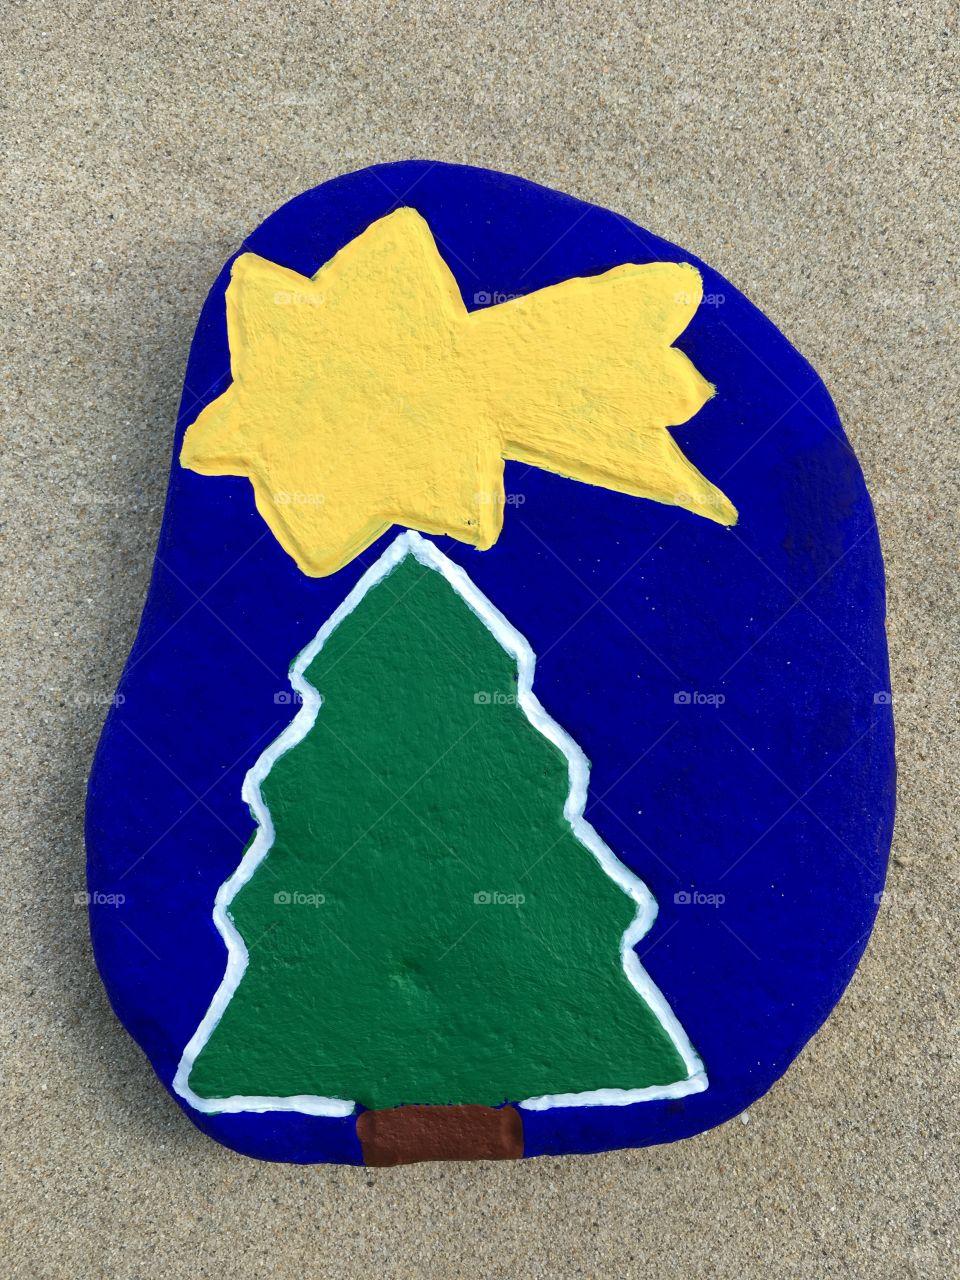 Christmas tree on a stone